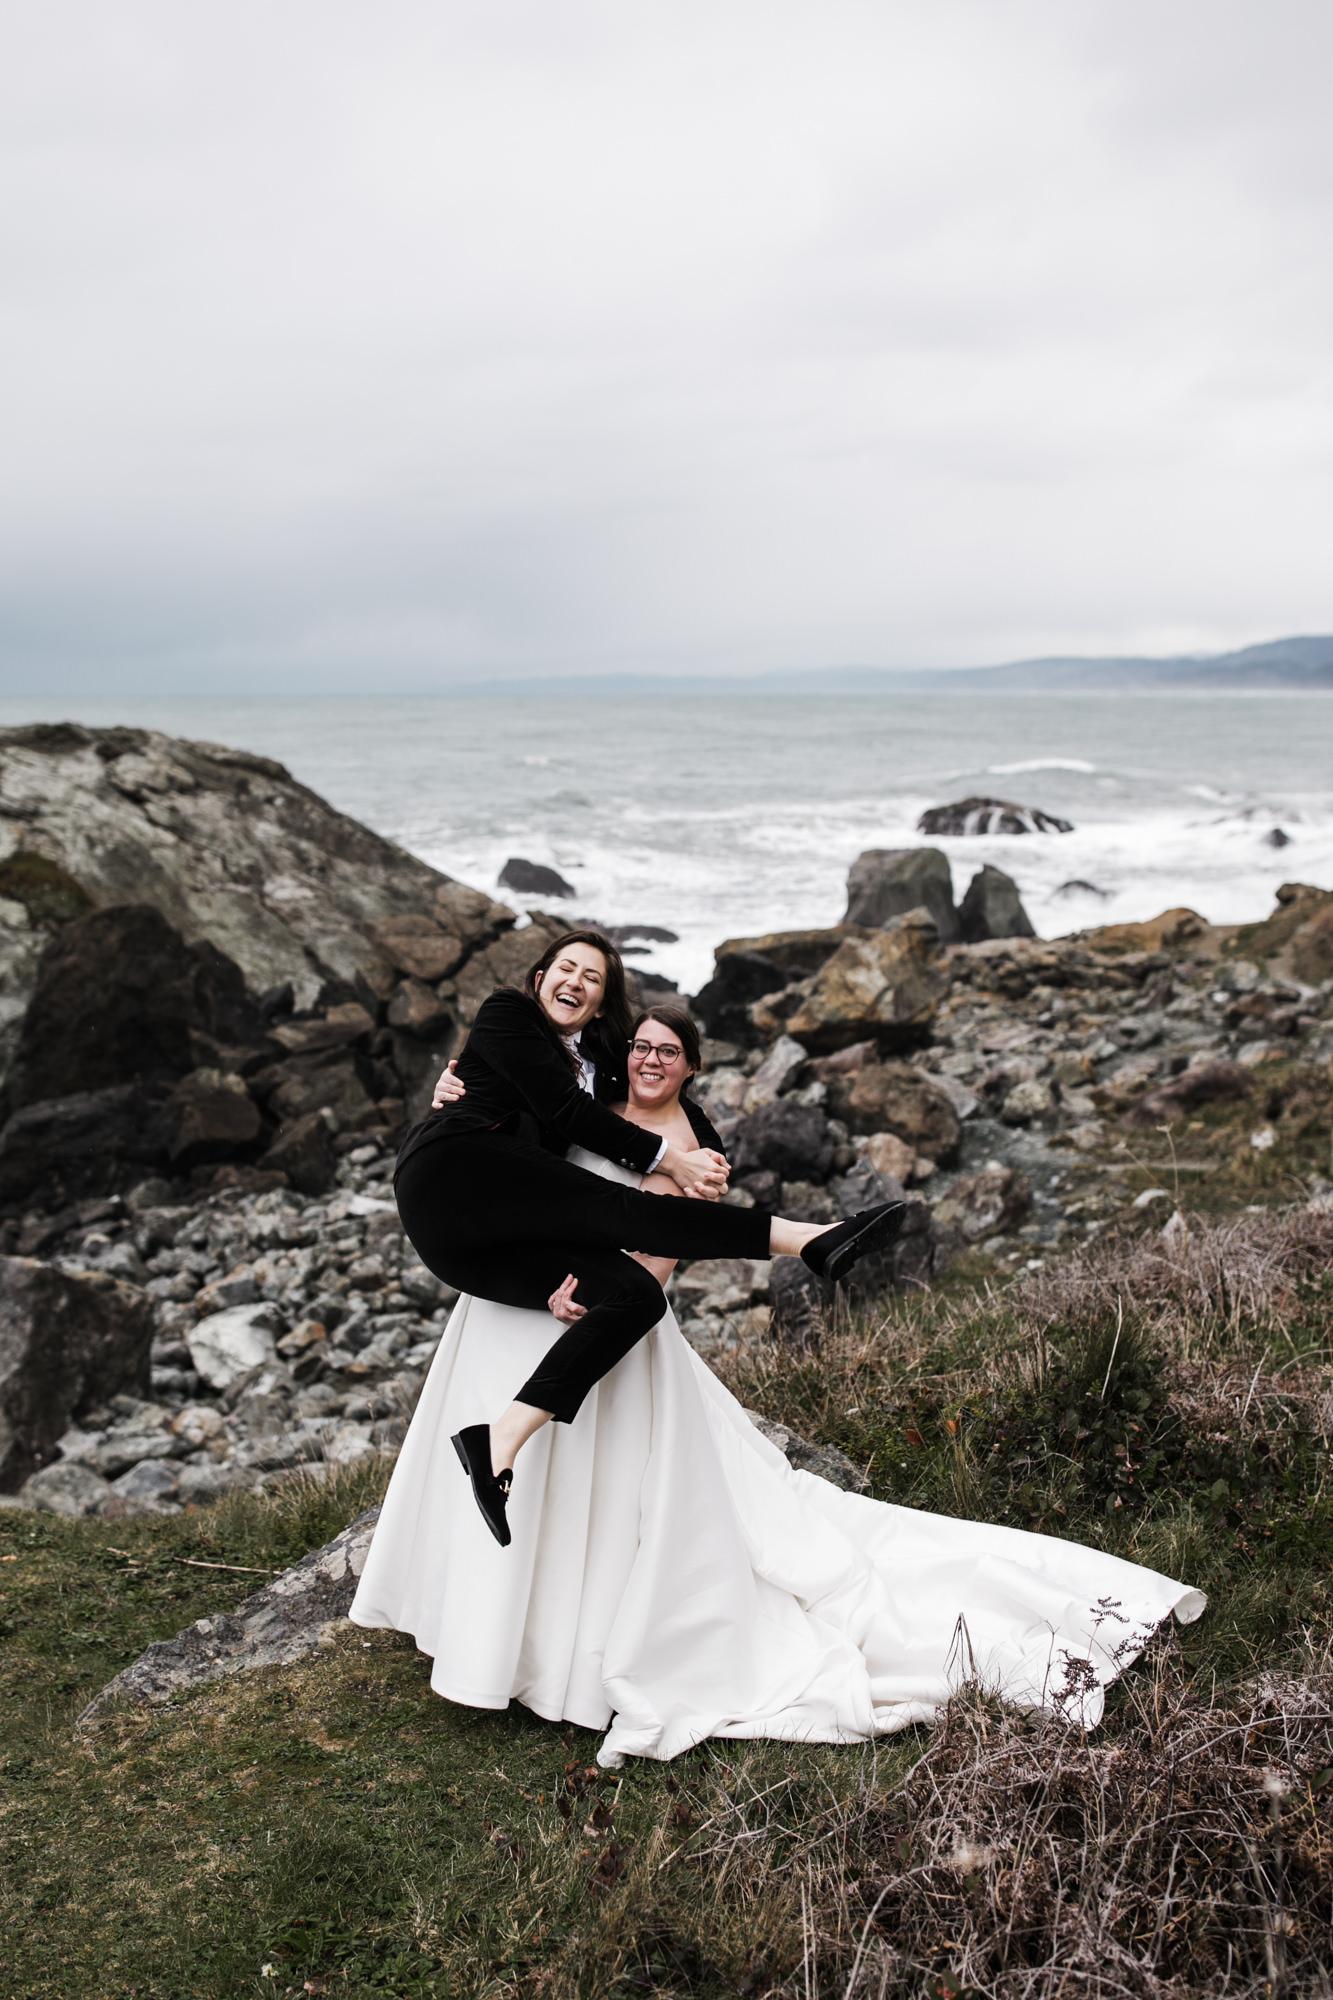 redwood-national-park-elopement-photographer-48.jpg